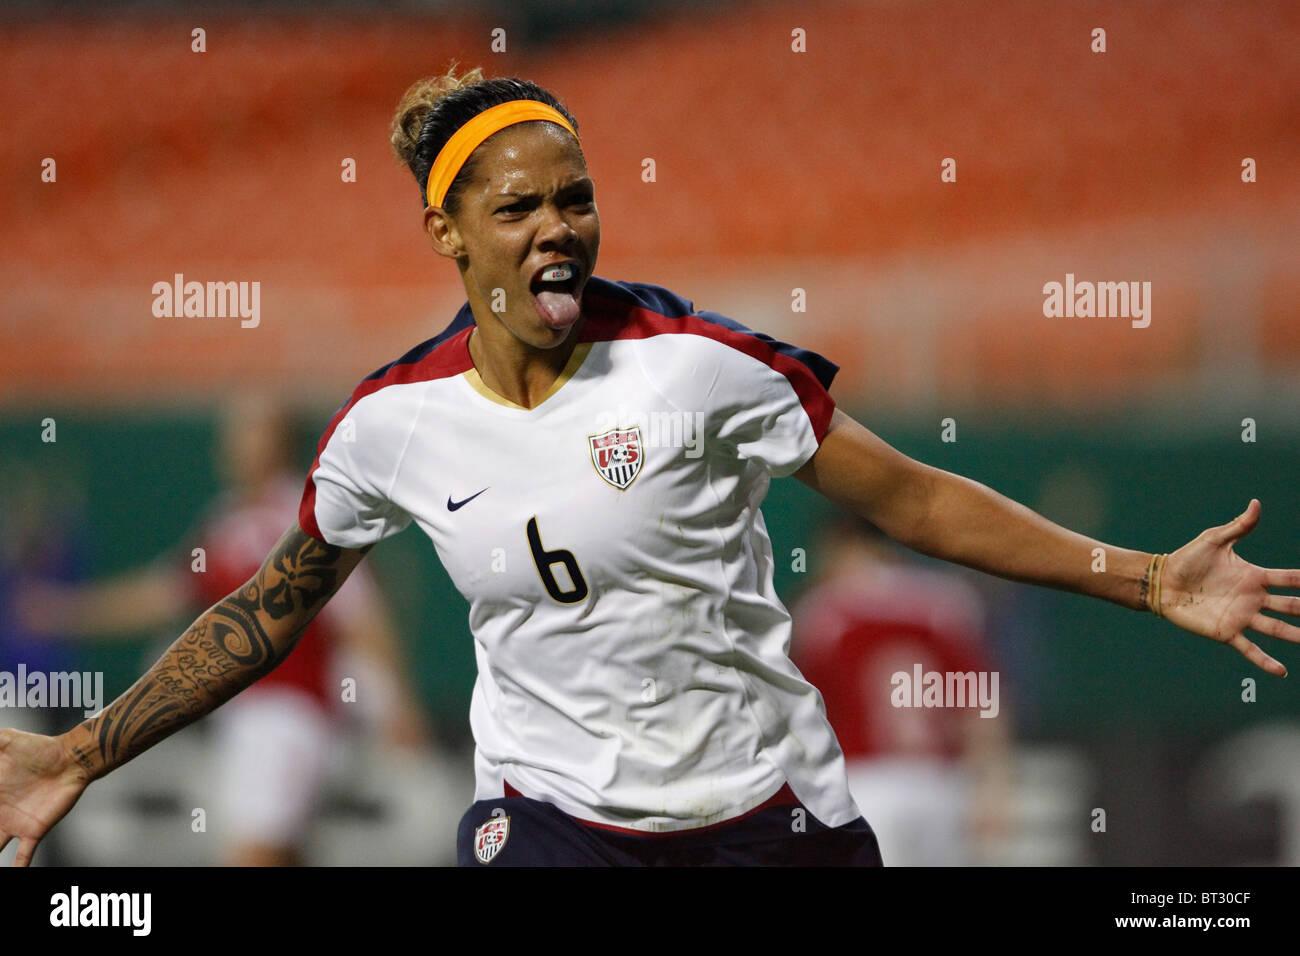 fe079a066a5 United States forward Natasha Kai celebrates after scoring a goal against  Canada during an international soccer